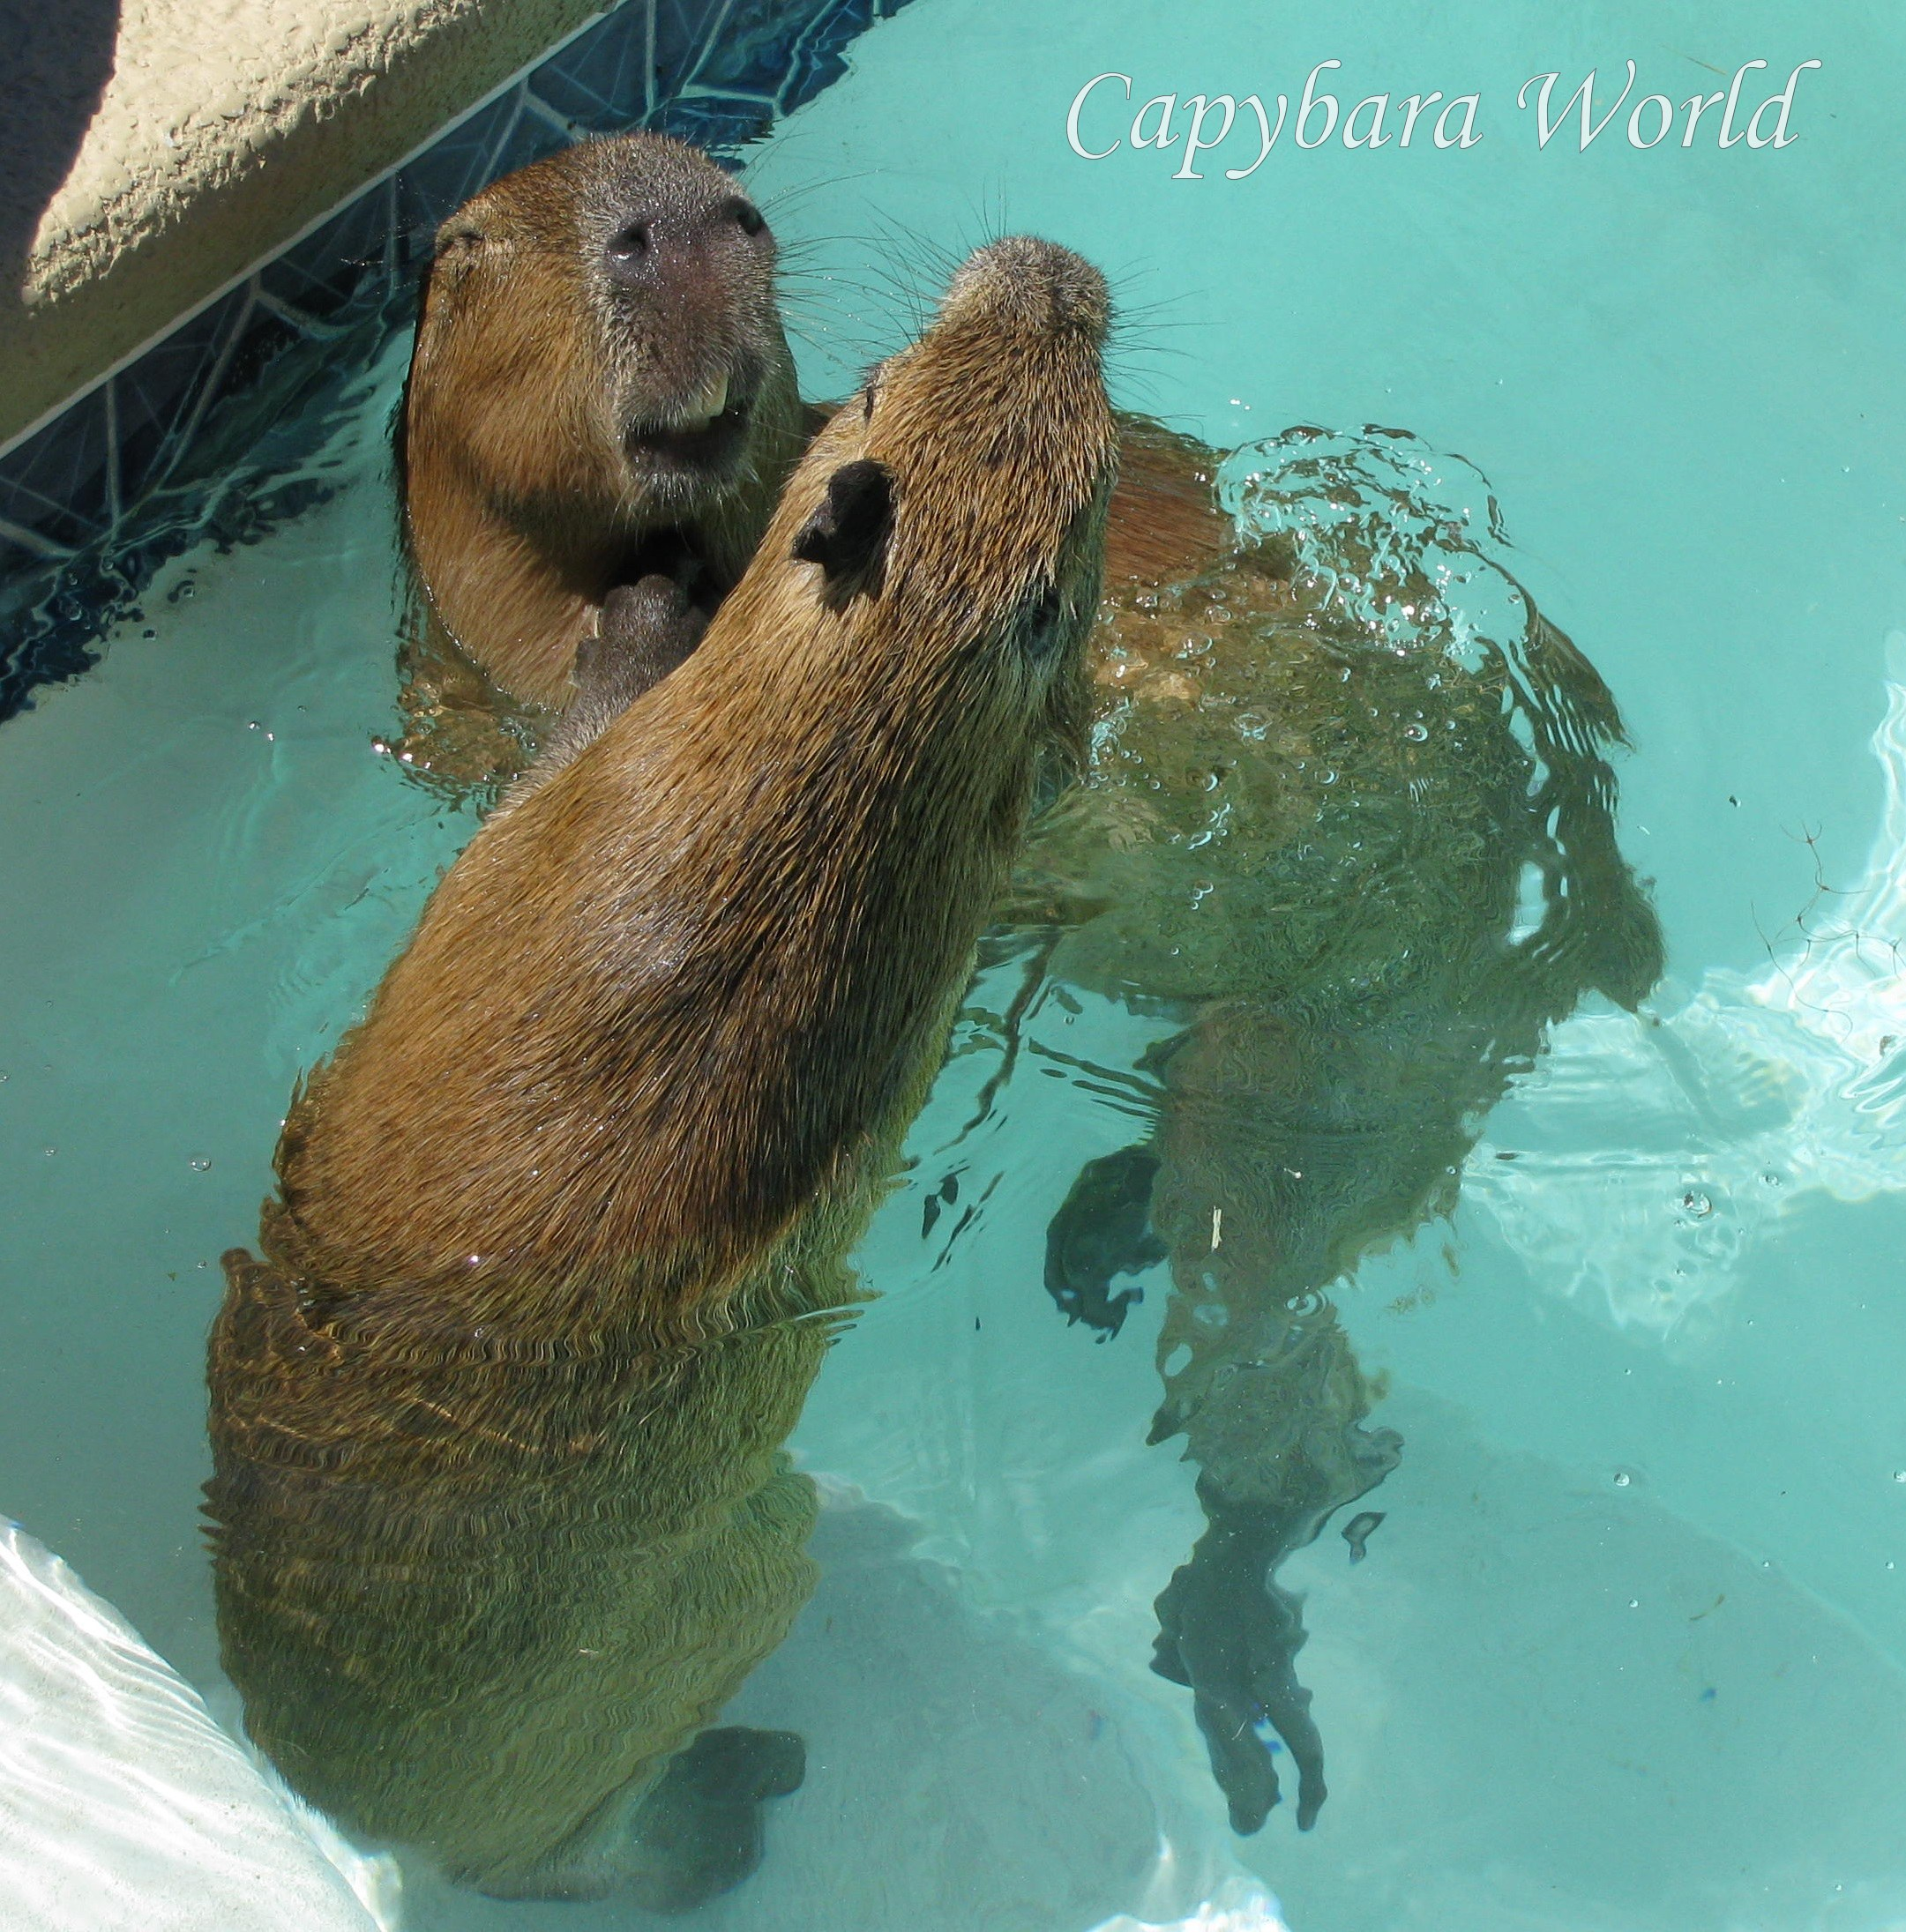 capybara wallpaper pool - photo #4